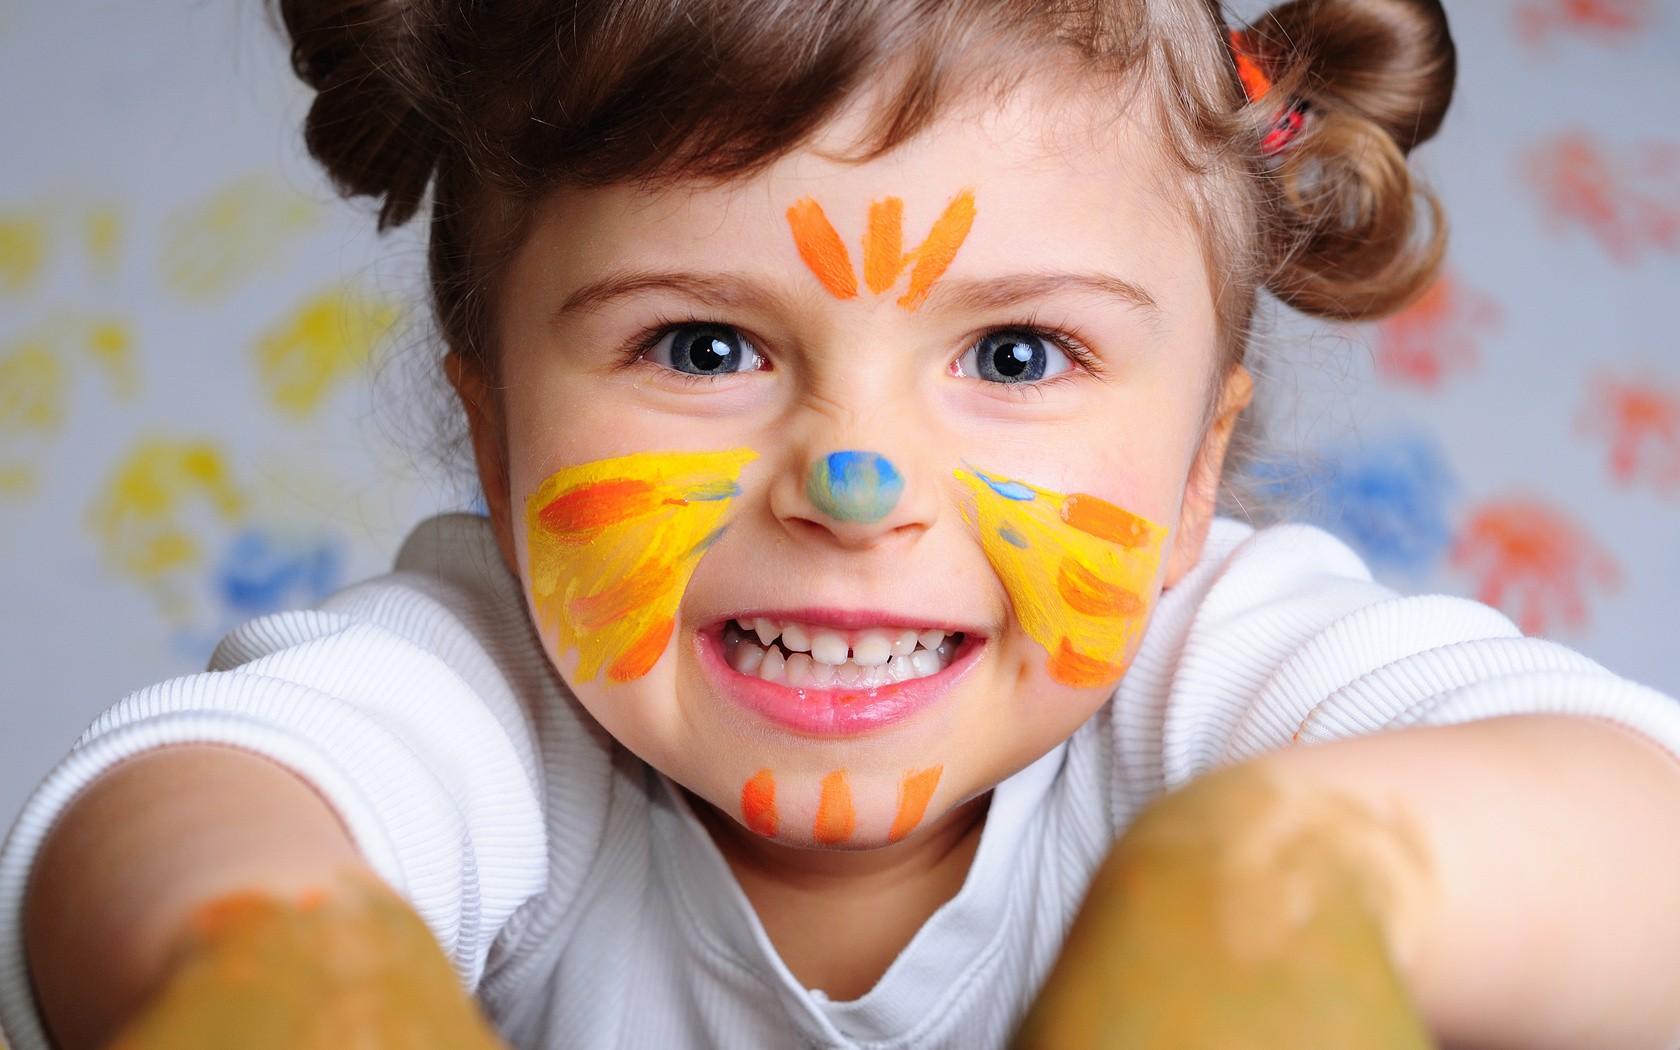 Wallpaper Menghadapi Potret Anak Kuning Rambut Mulut Rautan Hidung Makanan Emosi Orang Kulit Badut Kepala Tawa Warna Laki